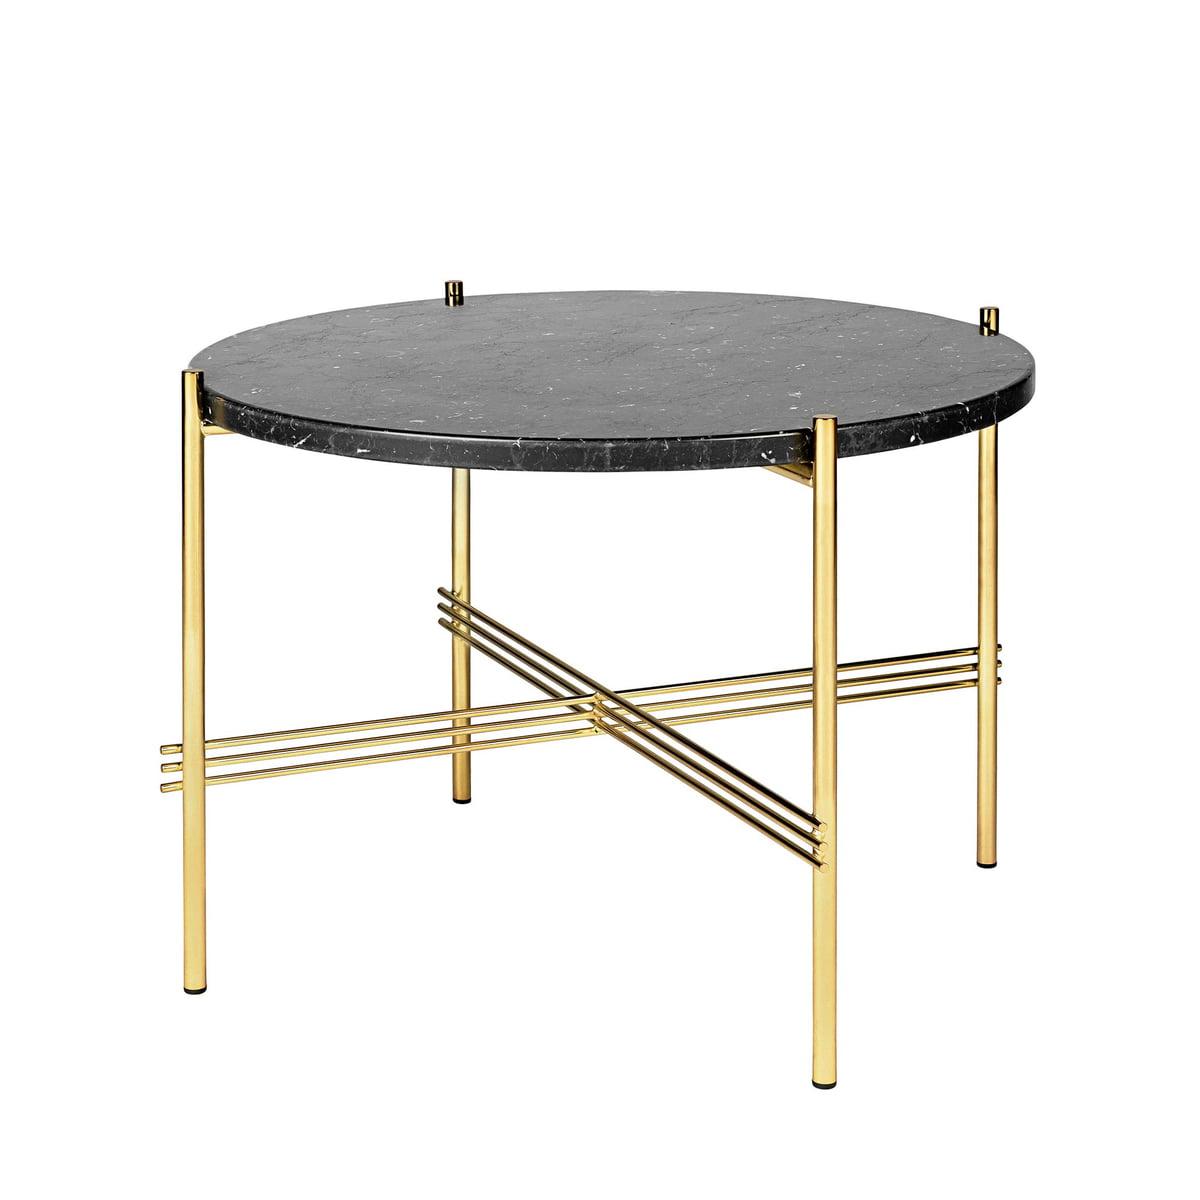 gubi ts couchtisch 55 cm messing marmor schwarz. Black Bedroom Furniture Sets. Home Design Ideas